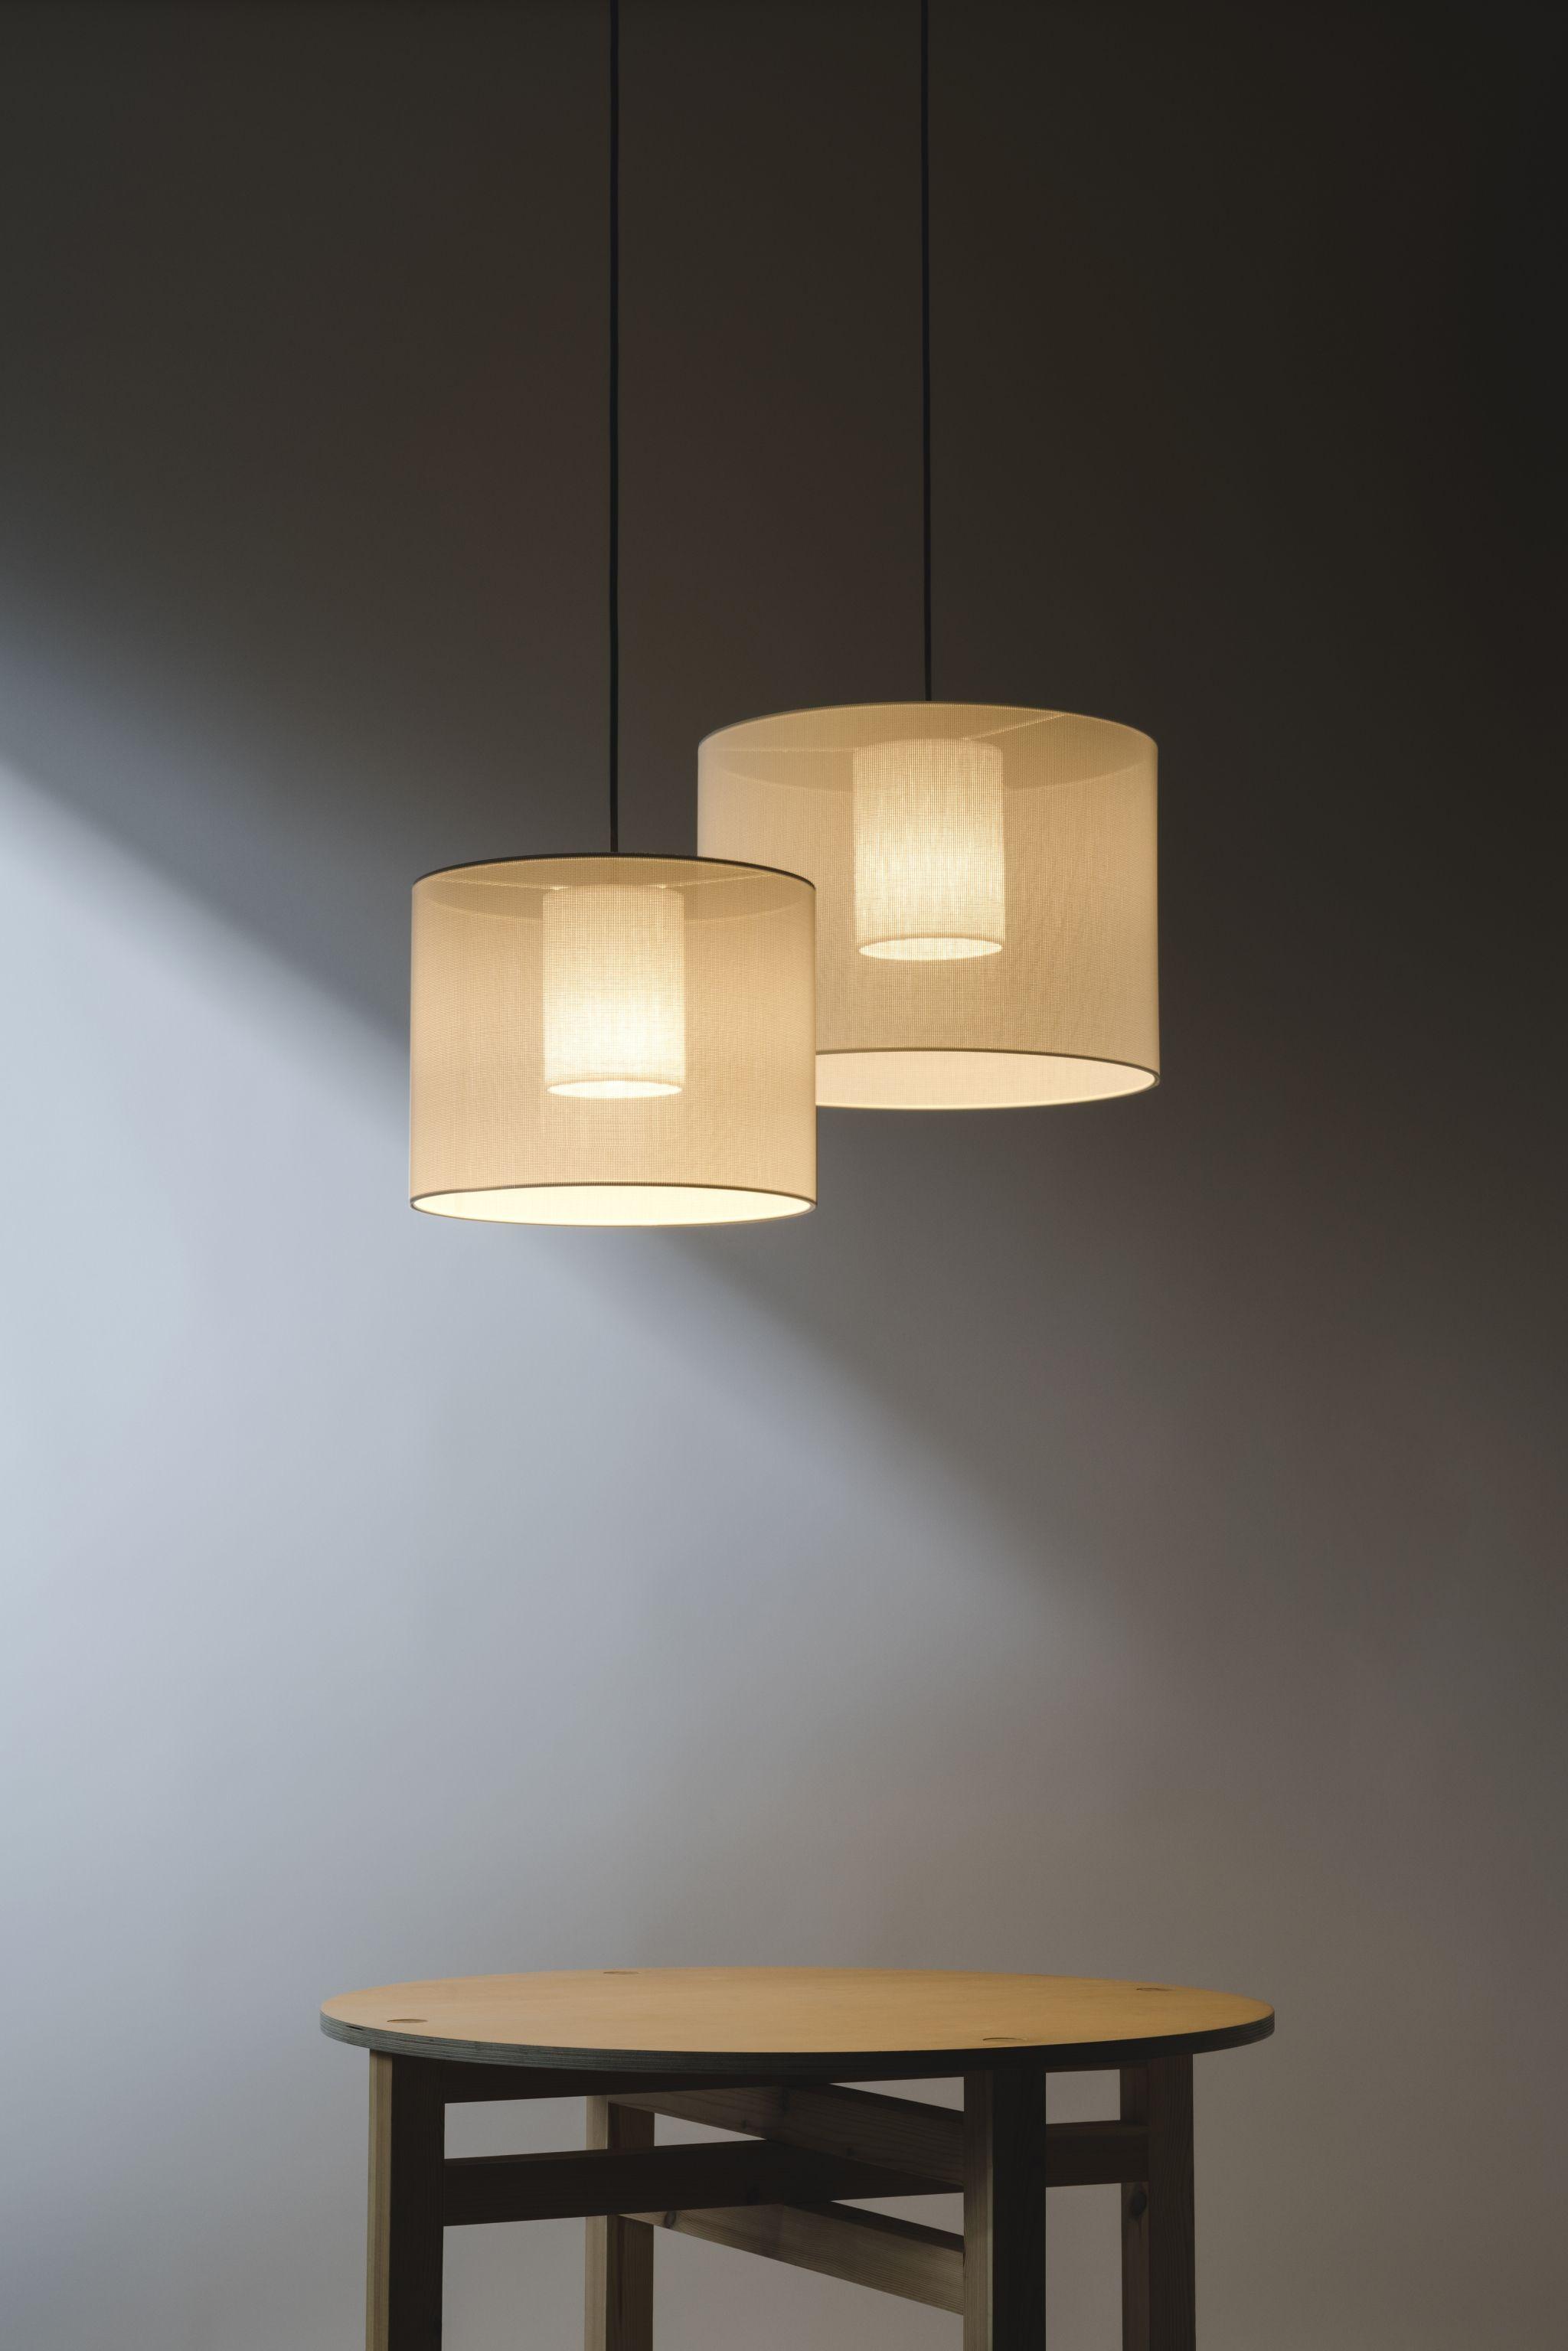 Meet The Harmonious Light Of The New Moare Liviana By Estudi